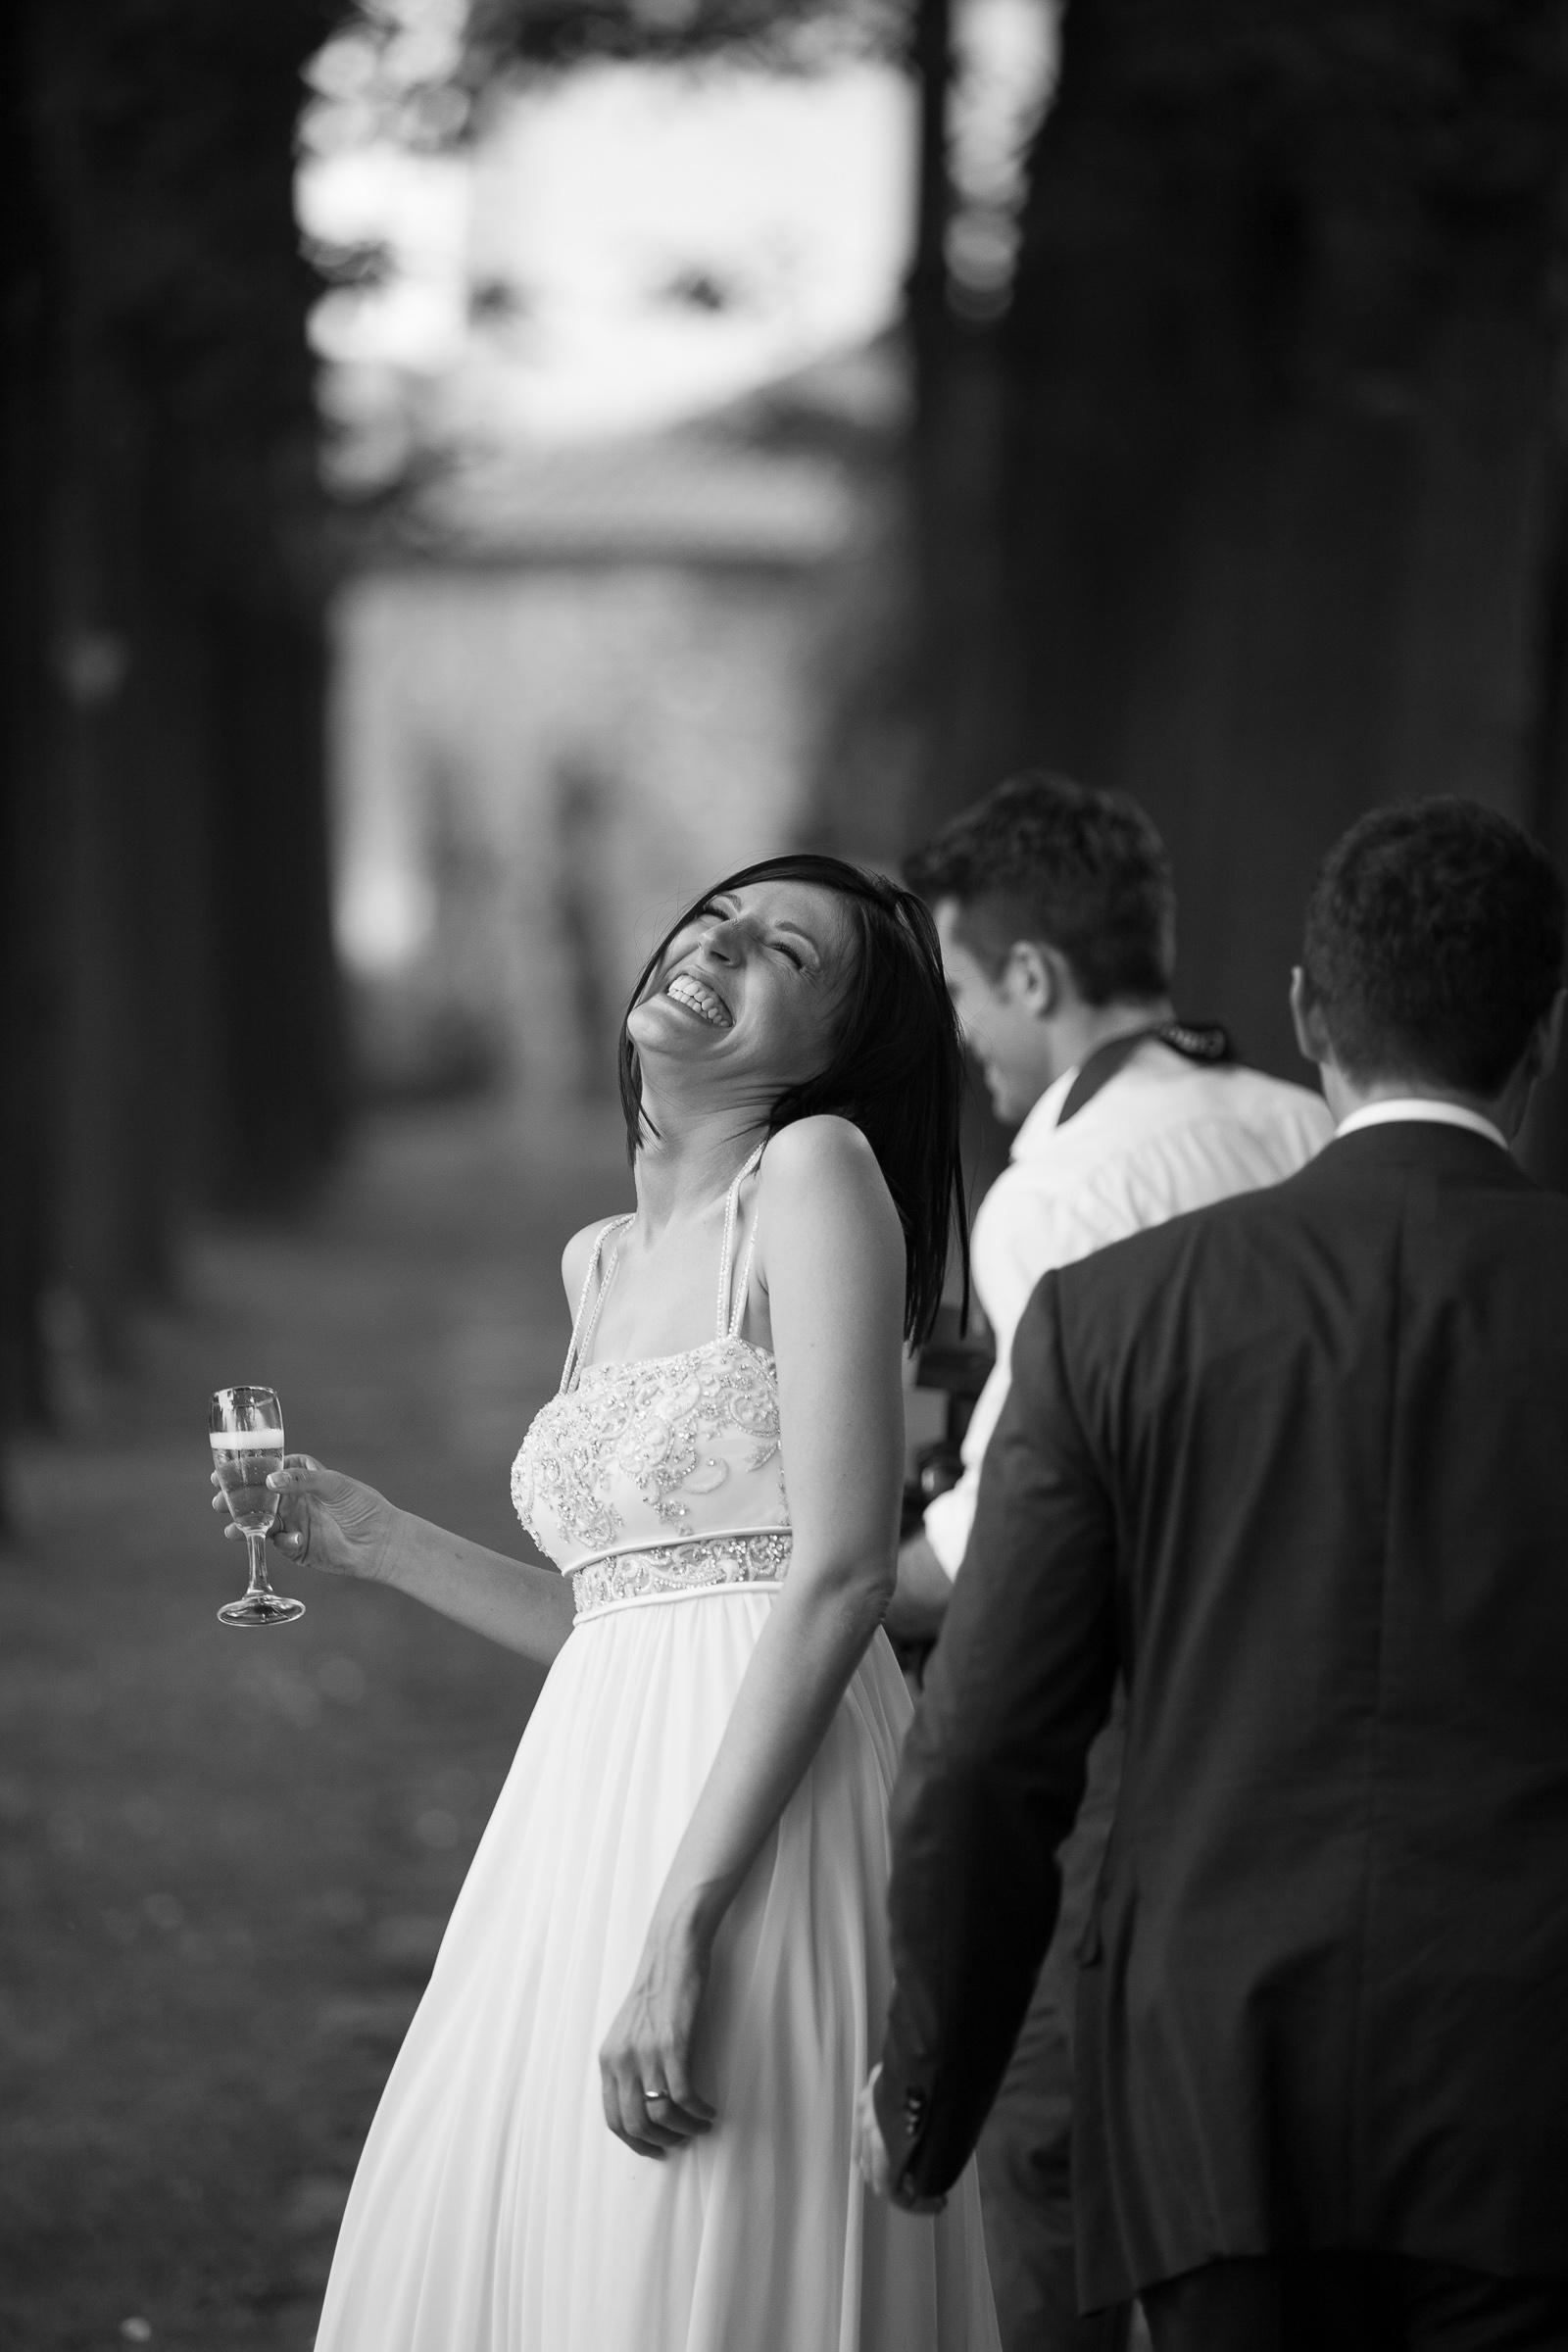 120609 - scandroglio - matrimonioAlessandroValeria-5404